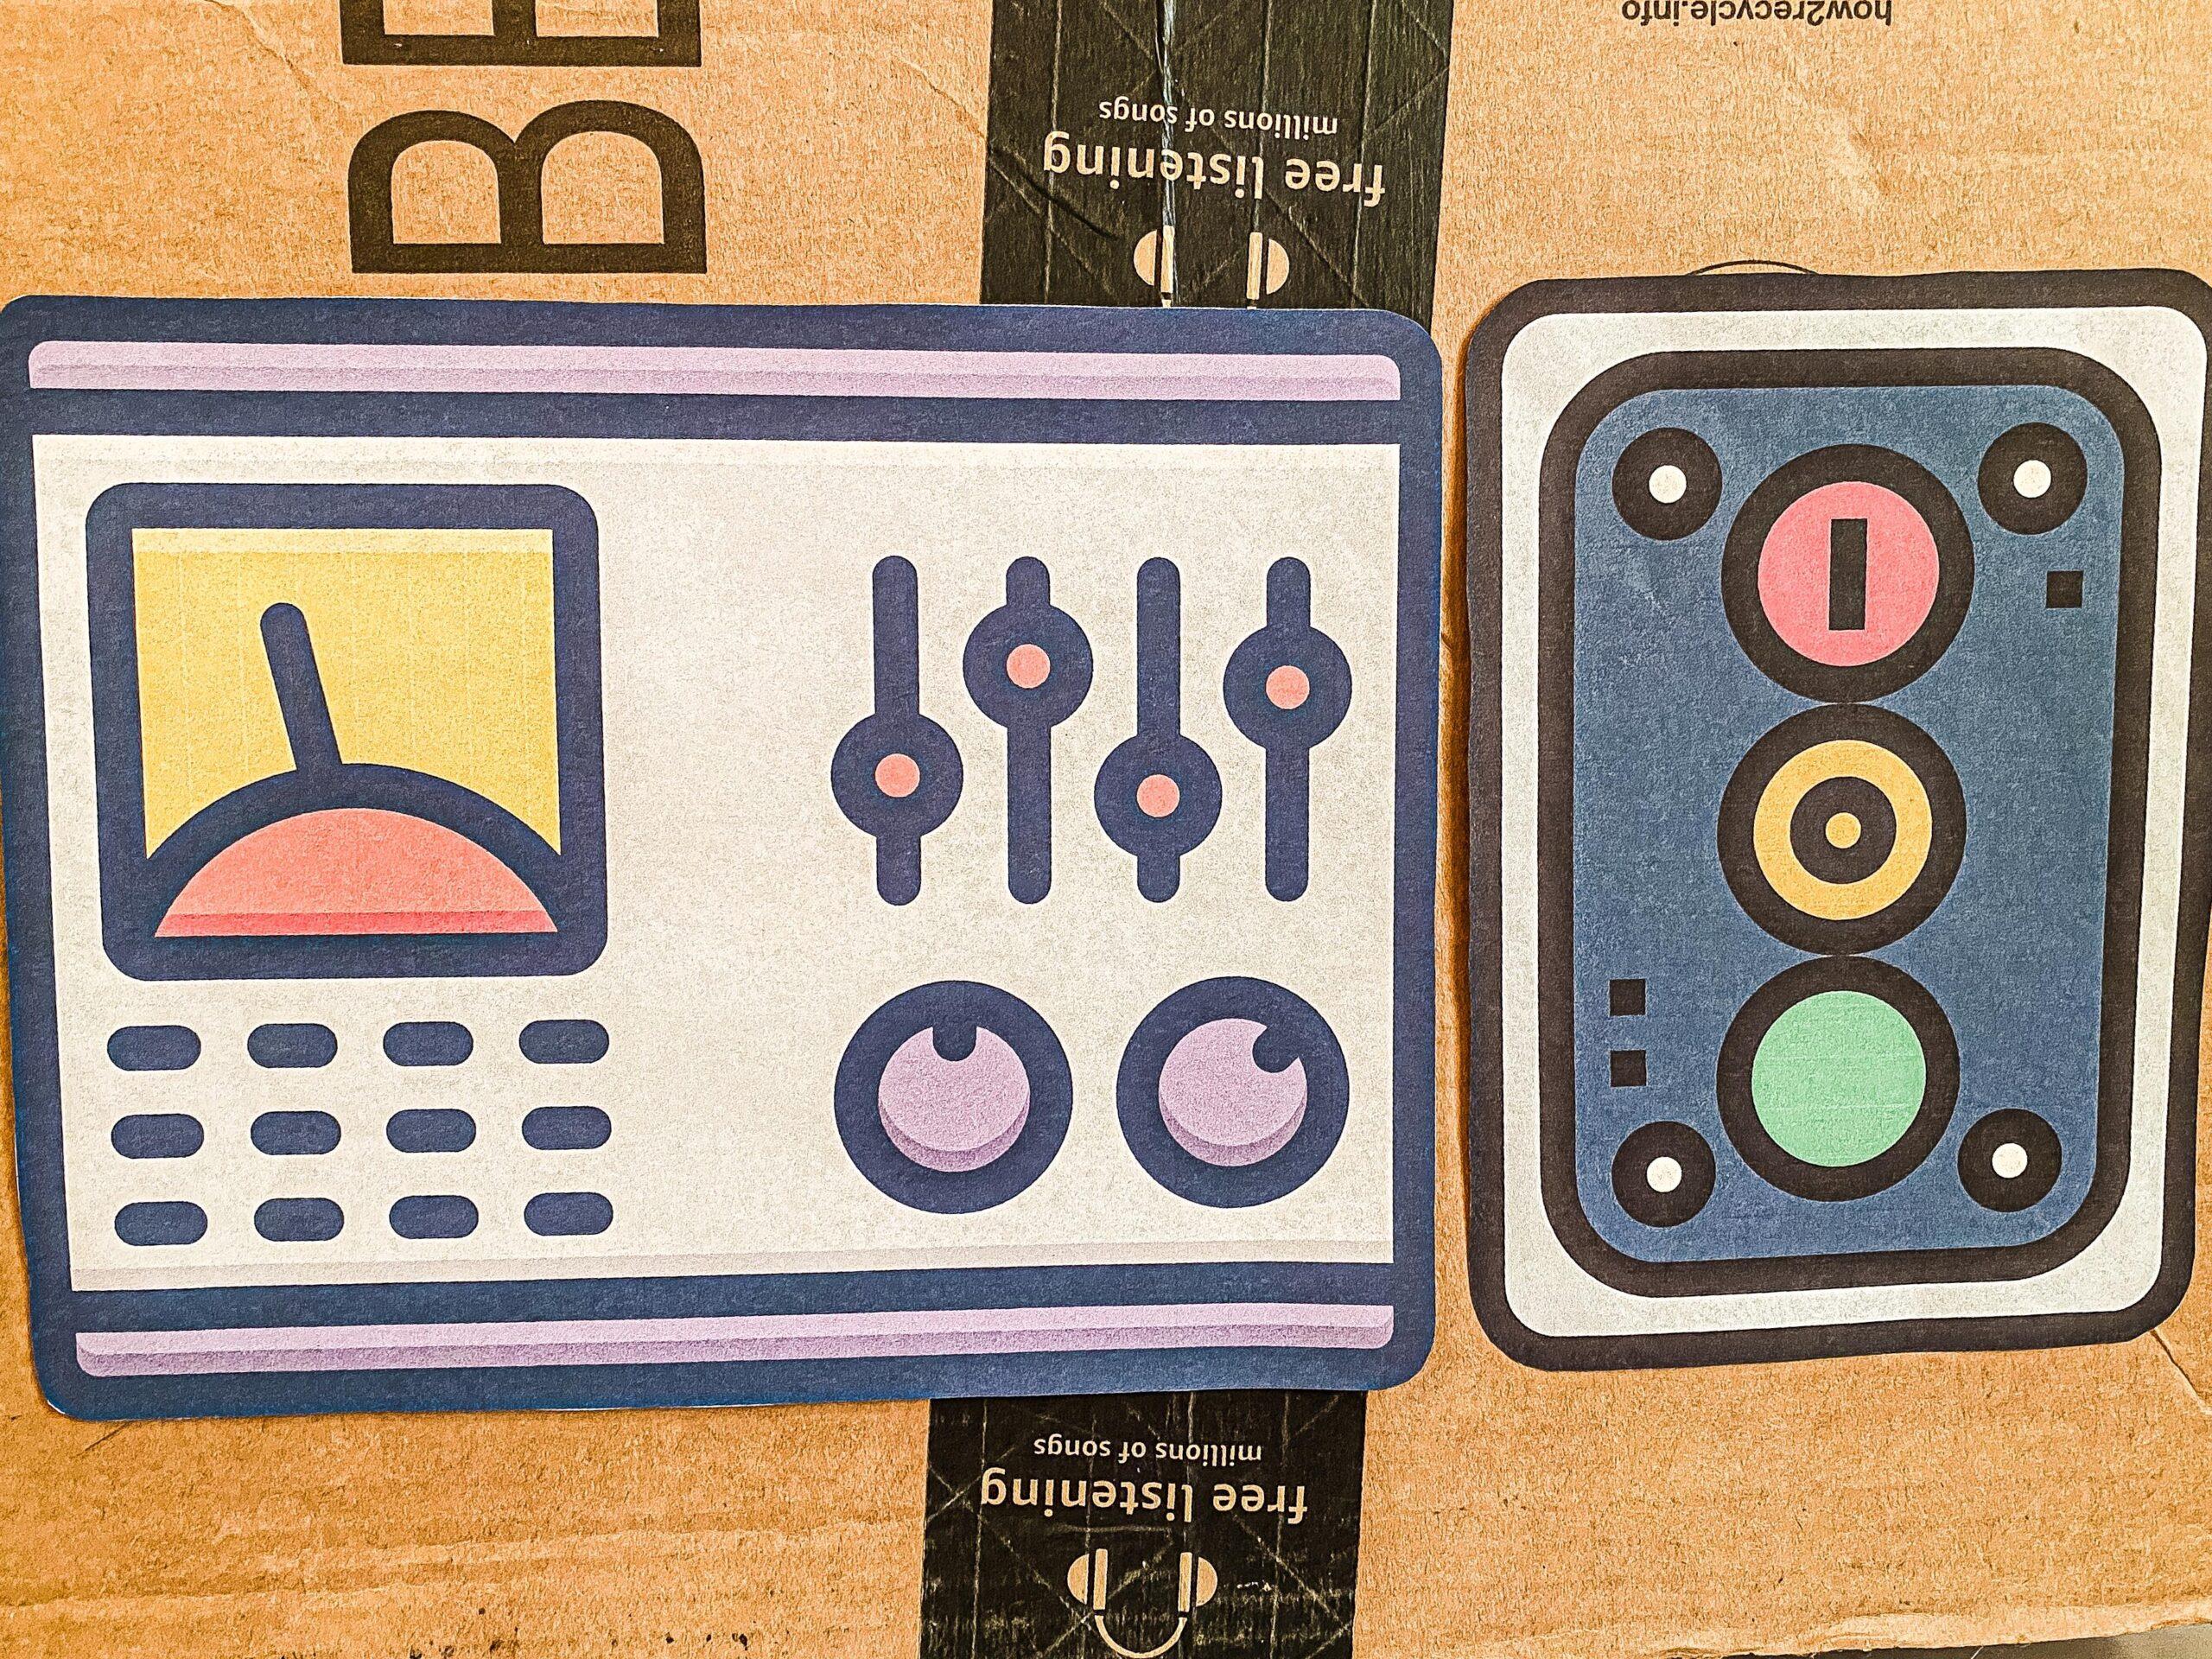 Astronaut Dramatic Play Bundle Printable Keypad Pretend Play for Kids